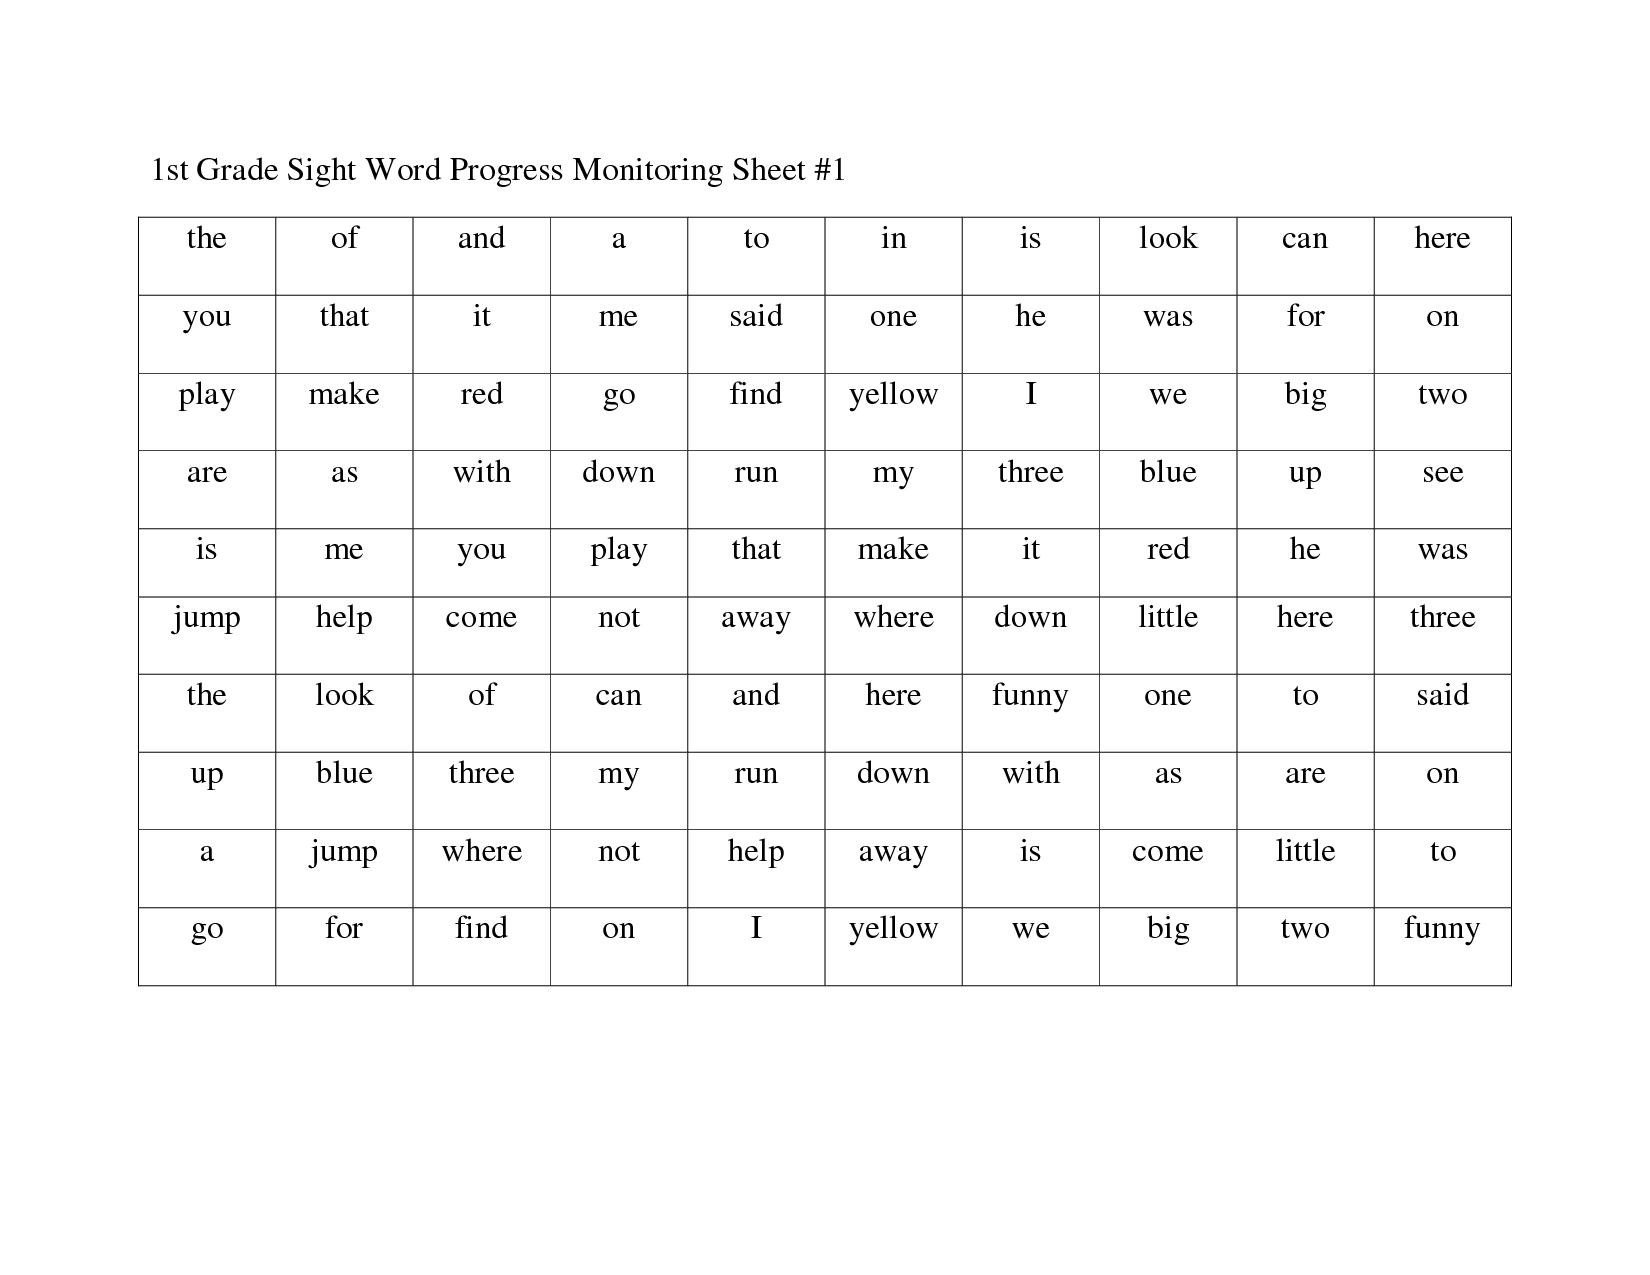 Progress Monitoring Sheet